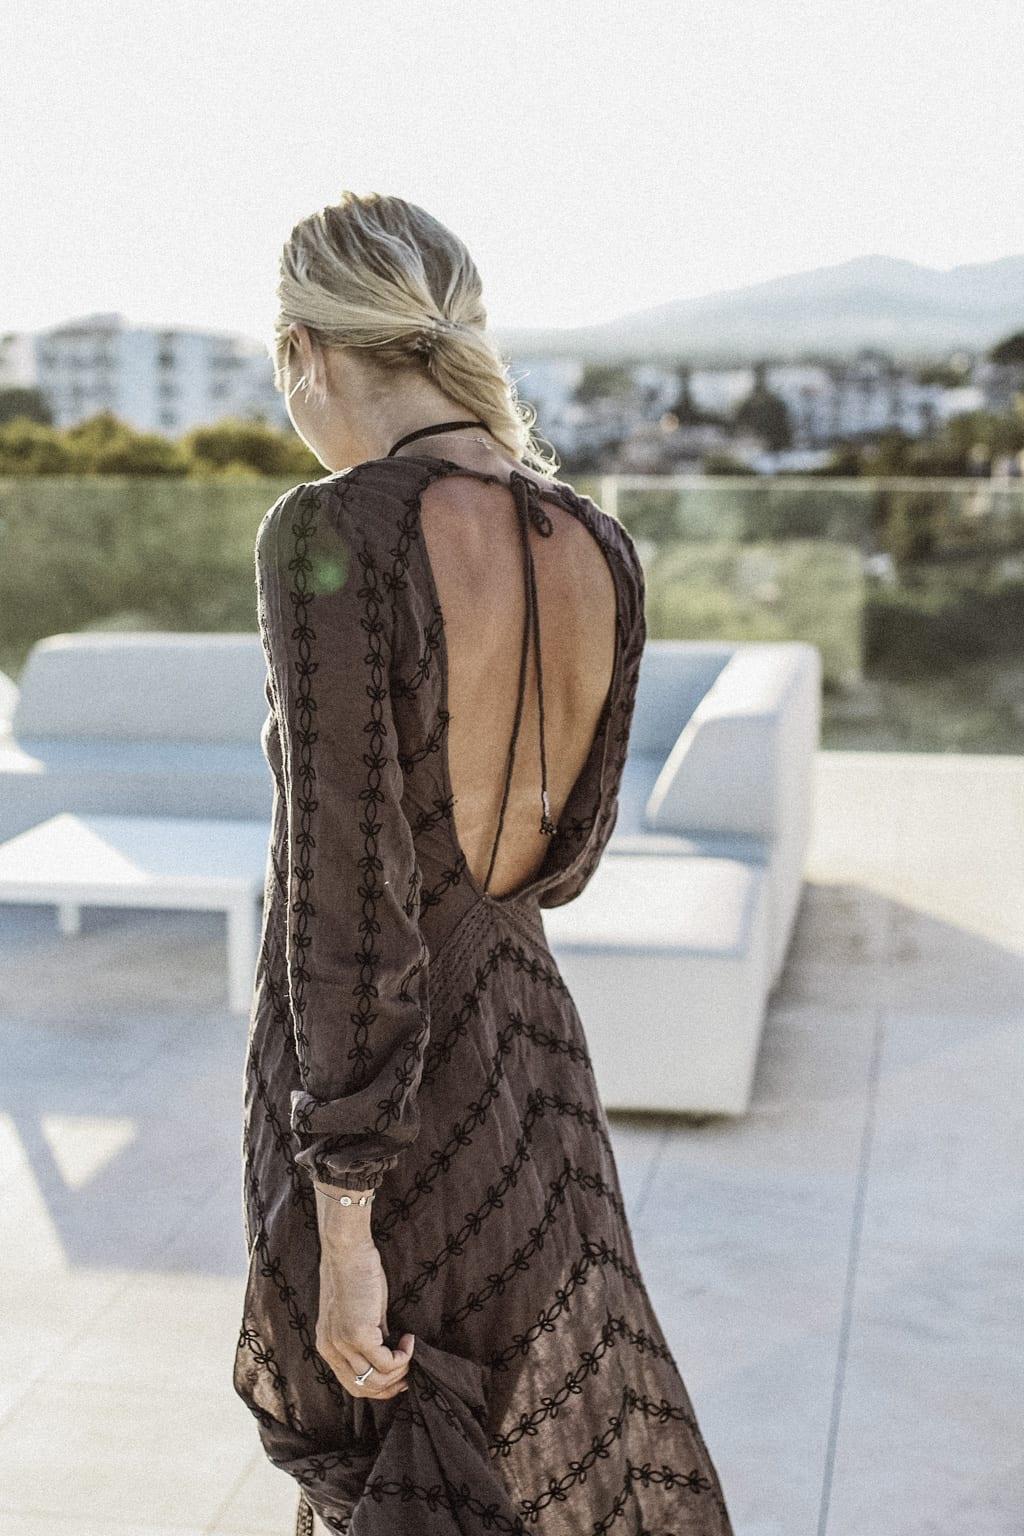 CK-1606-Mallorca-Island-Spain-Luxury-Holiday-Blogger-Beach-Outfit-Style-Fashion-Baleares-1041